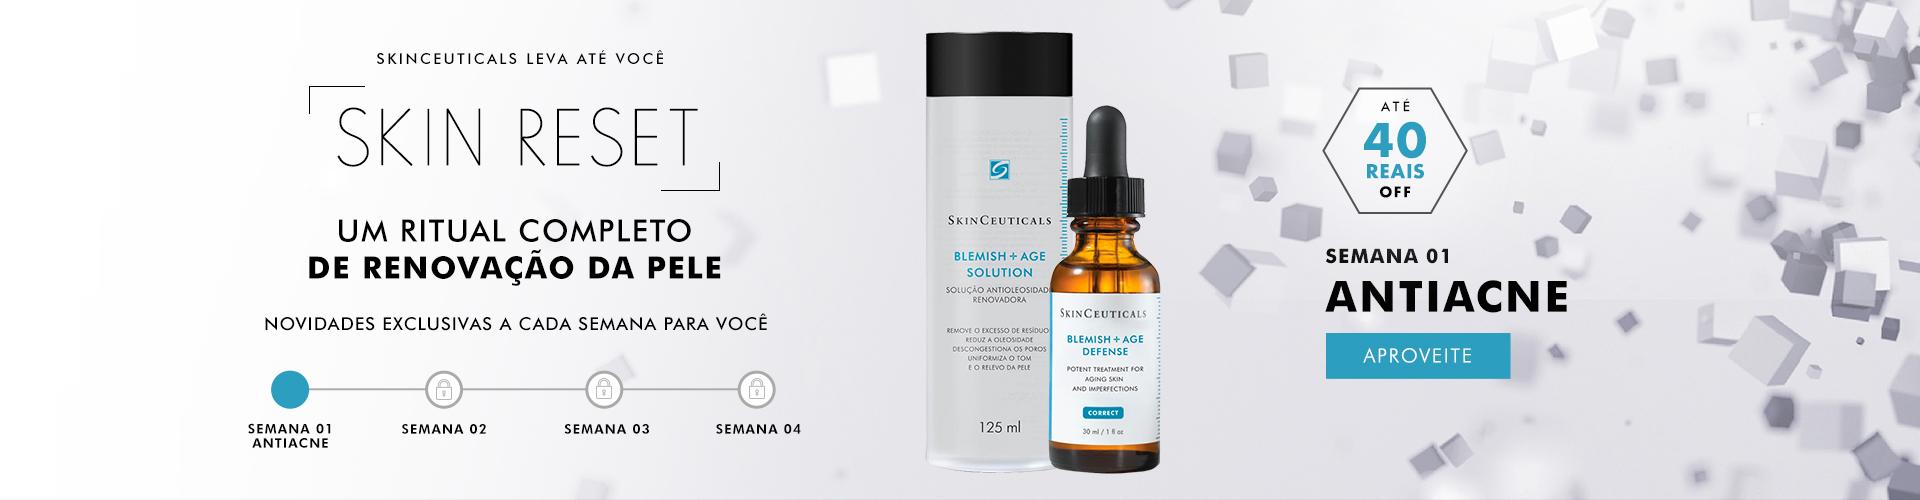 Skin Reset - Antiacne